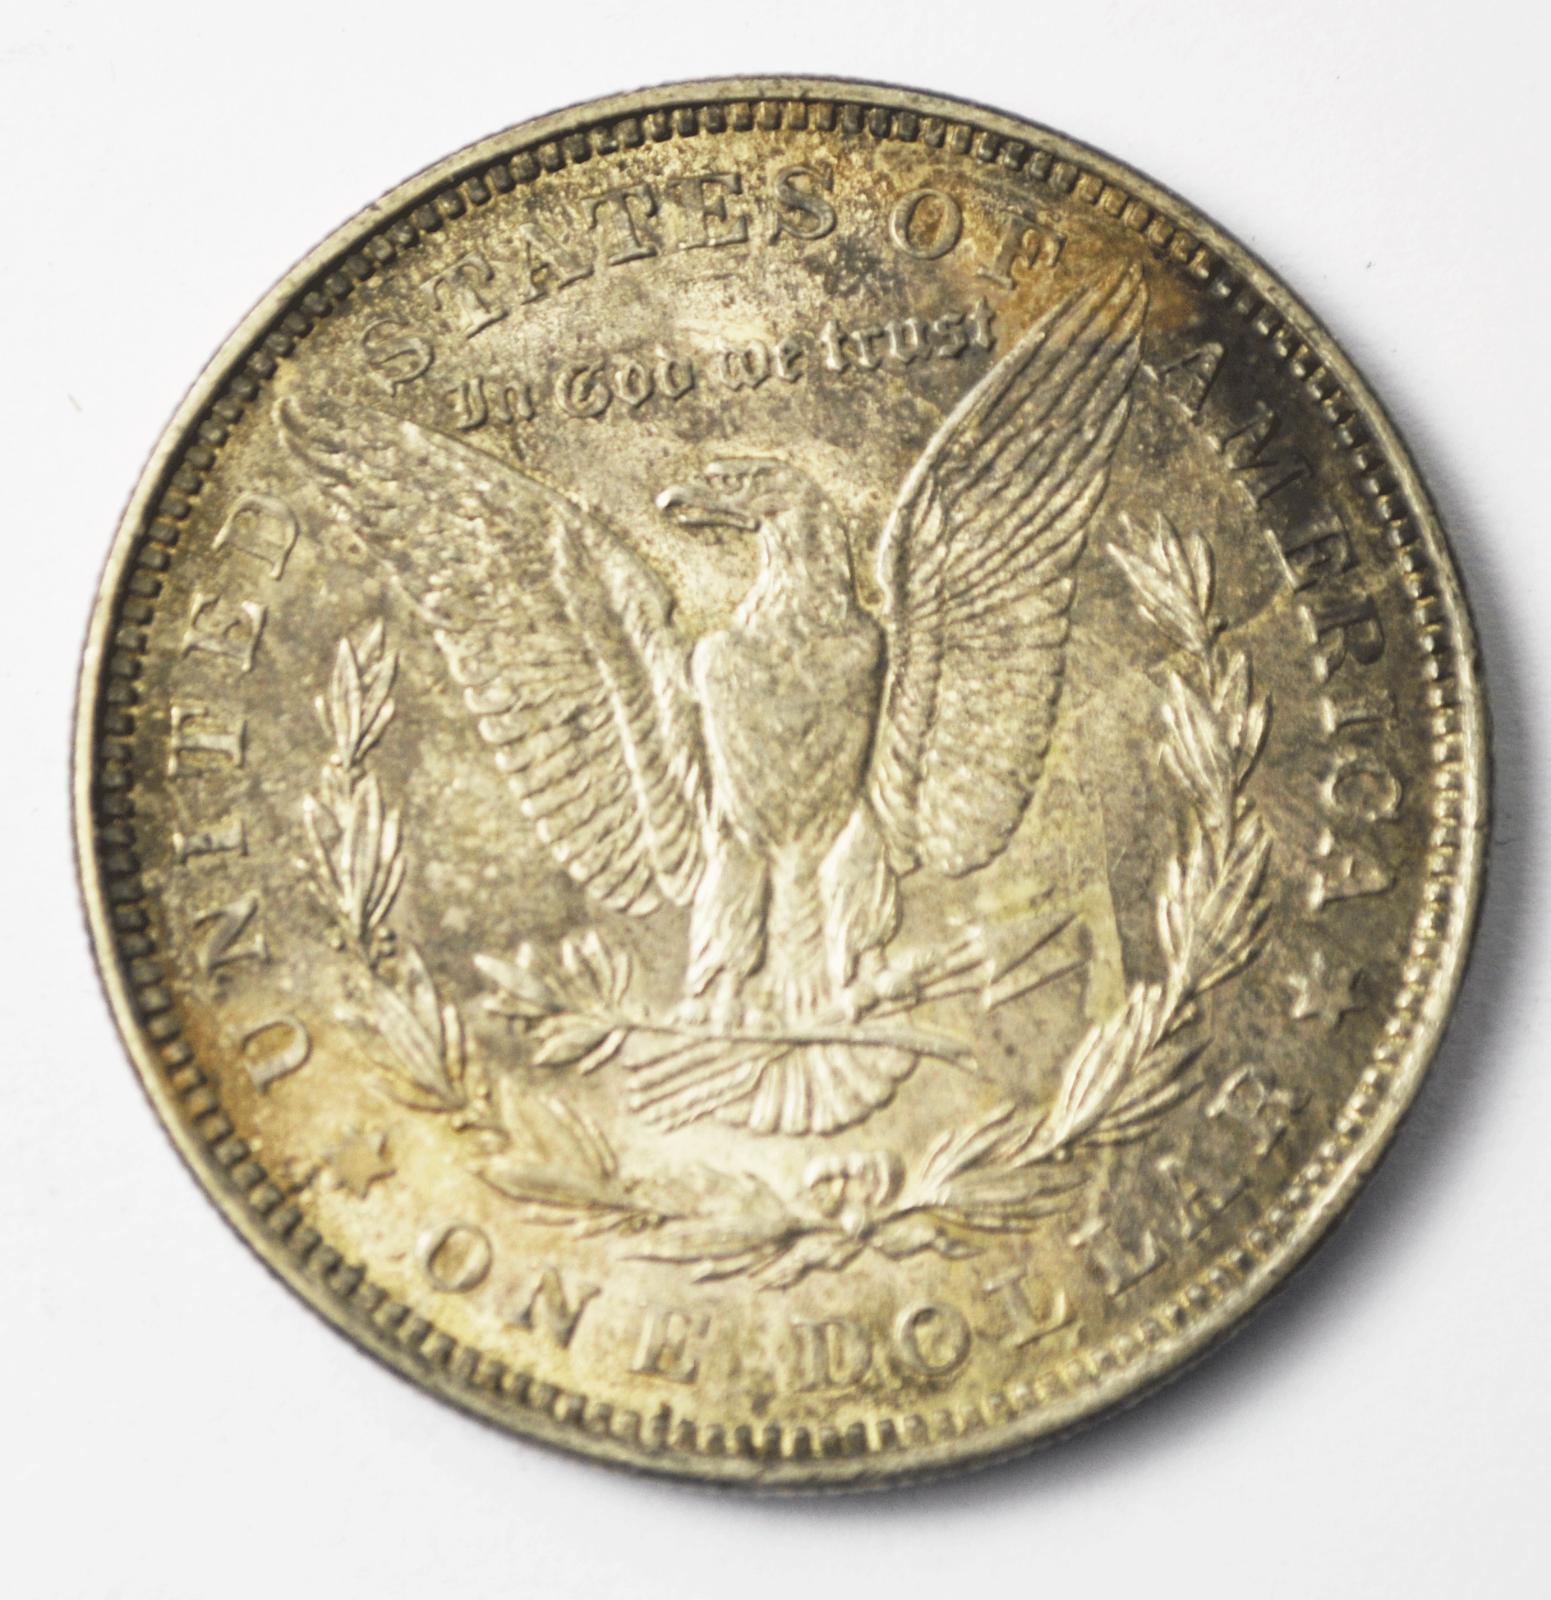 1921 $1 Morgan Silver One Dollar US Philadelphia VAM 3E2 Pitted Reverse